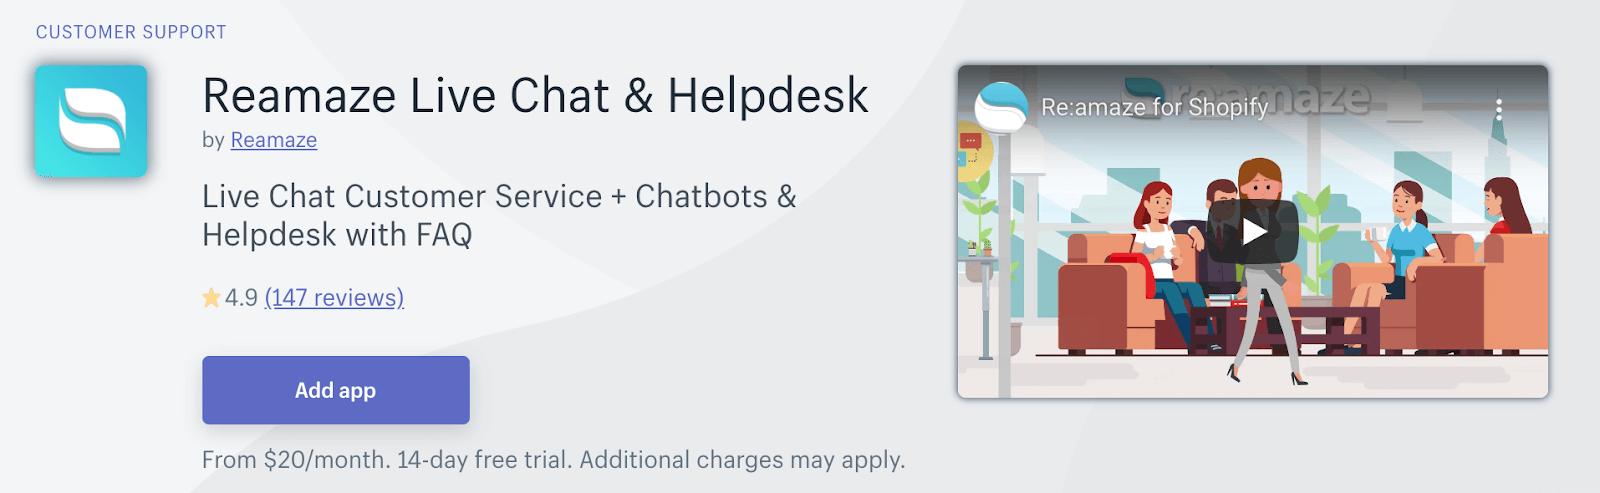 Shopify application - Re:amaze Live Chat & Helpdesk